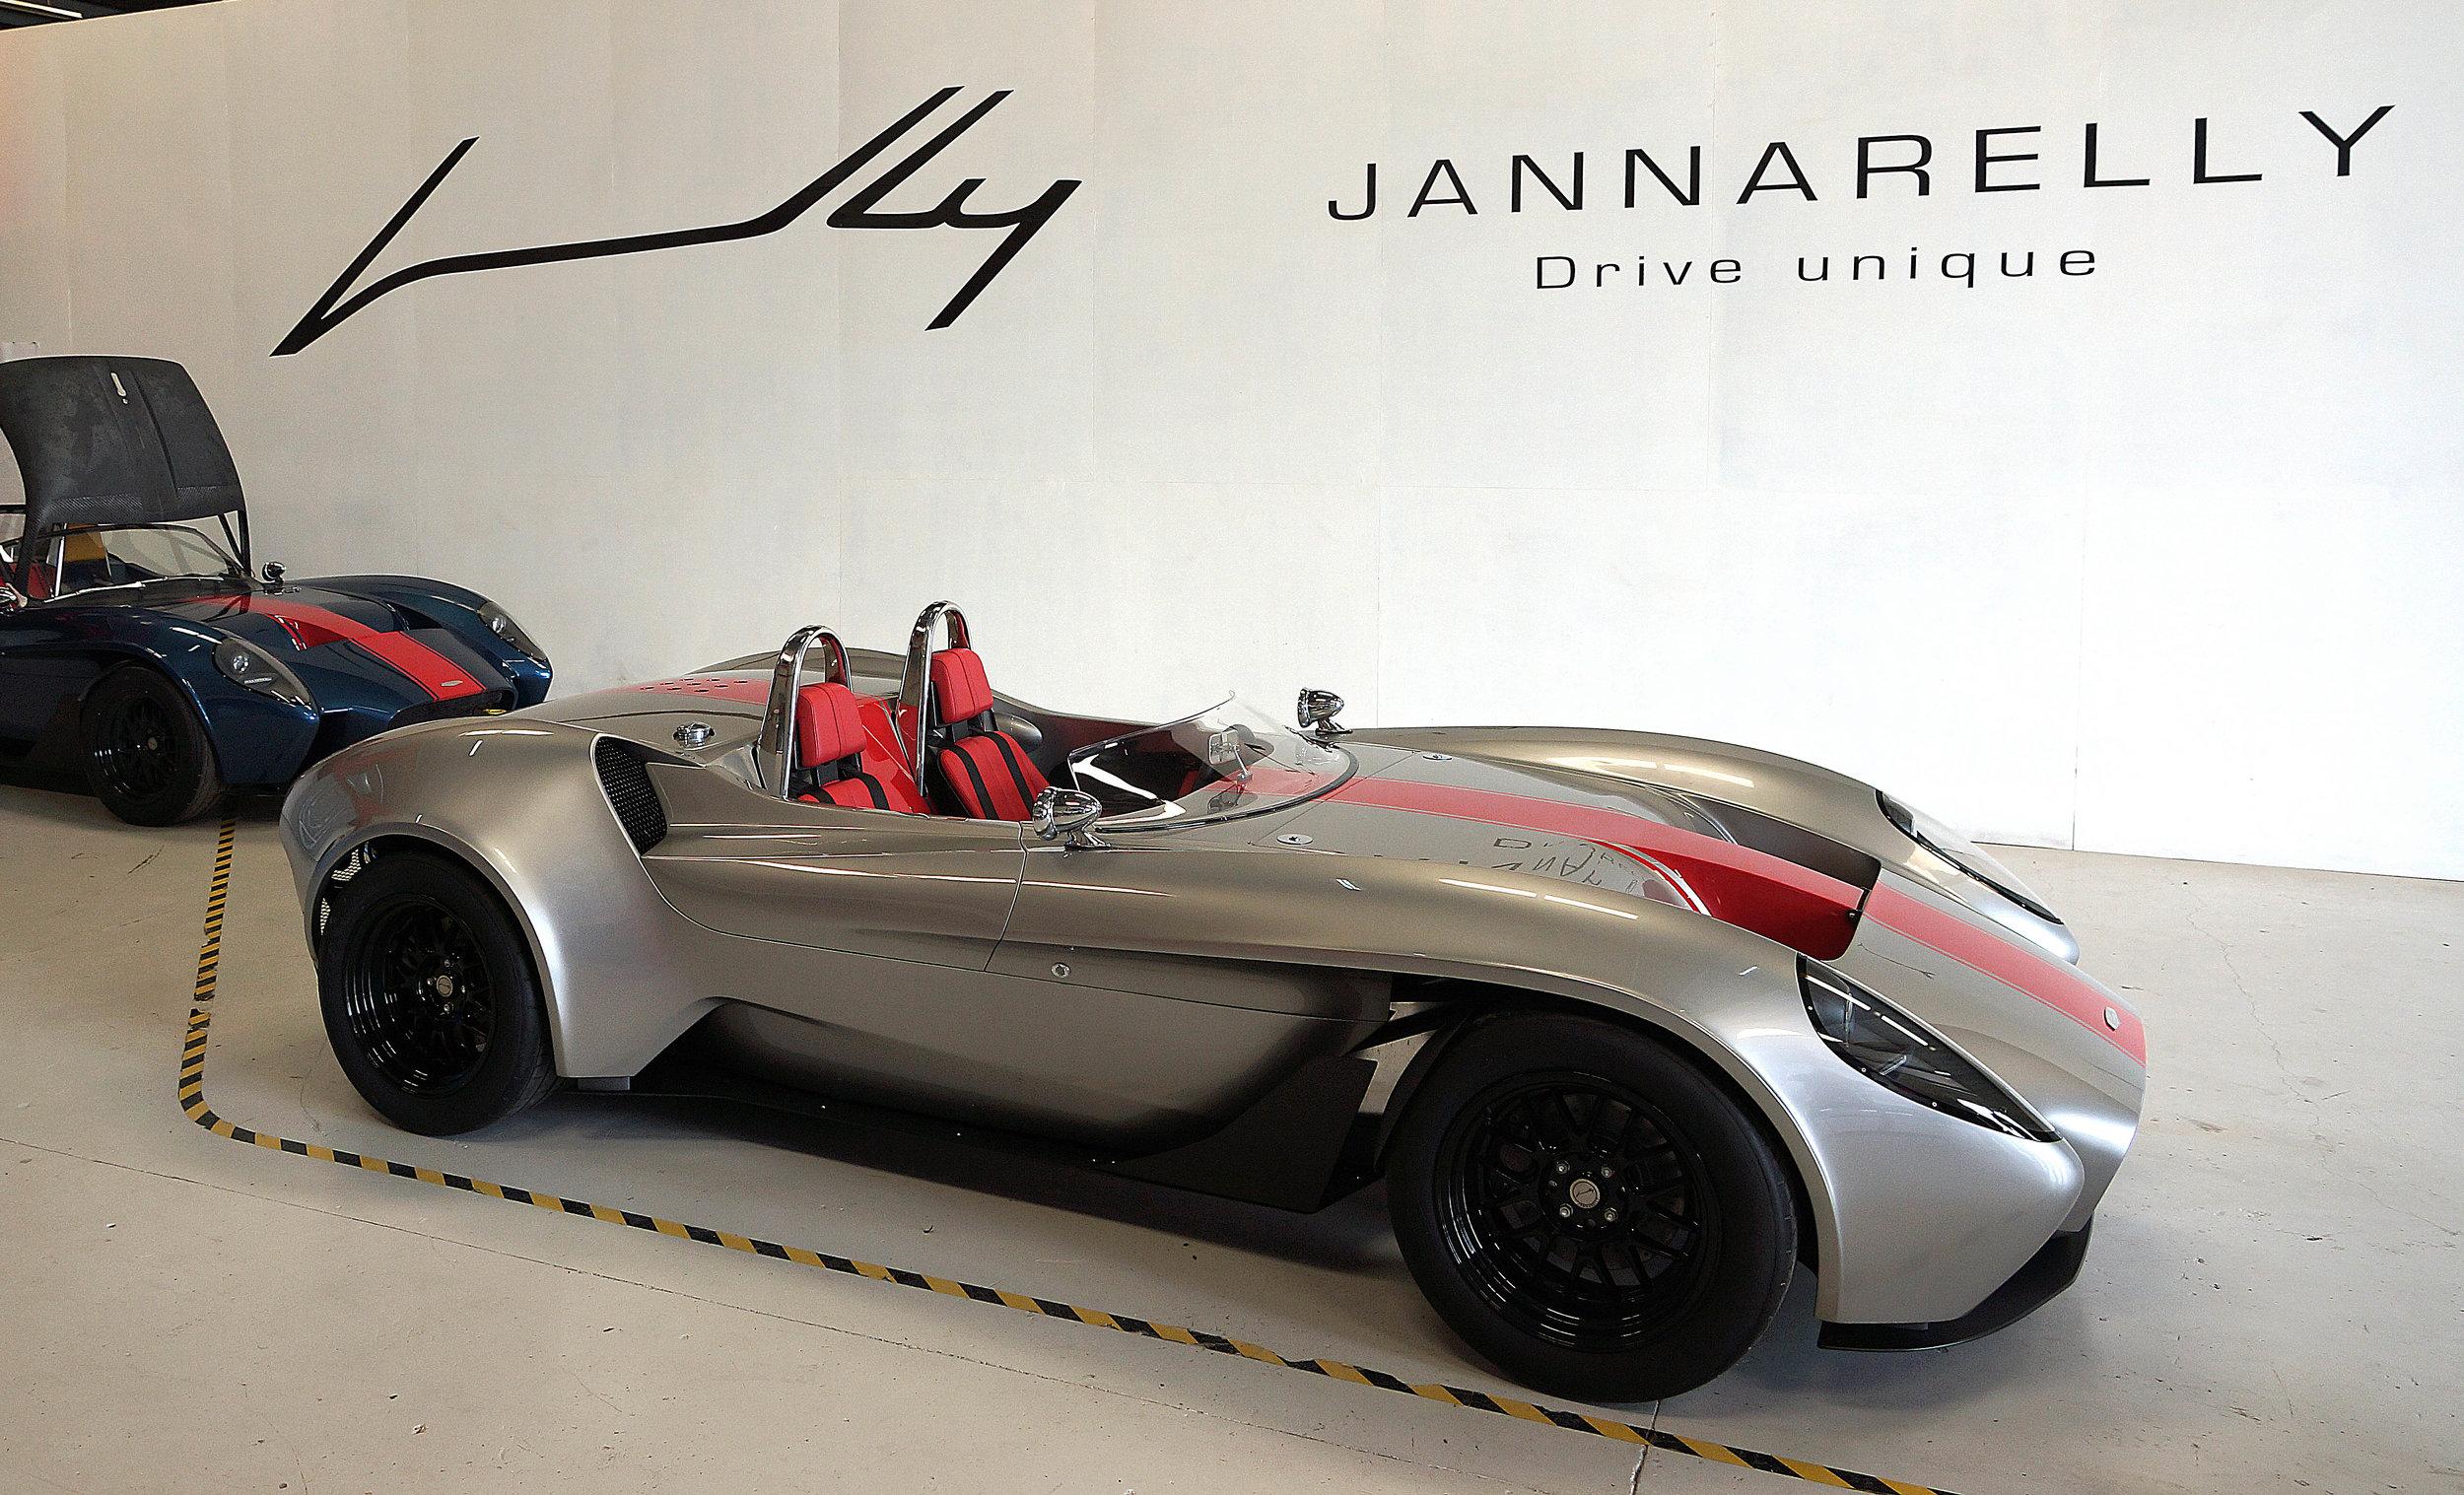 Jannarelly-France-Design-164.jpg